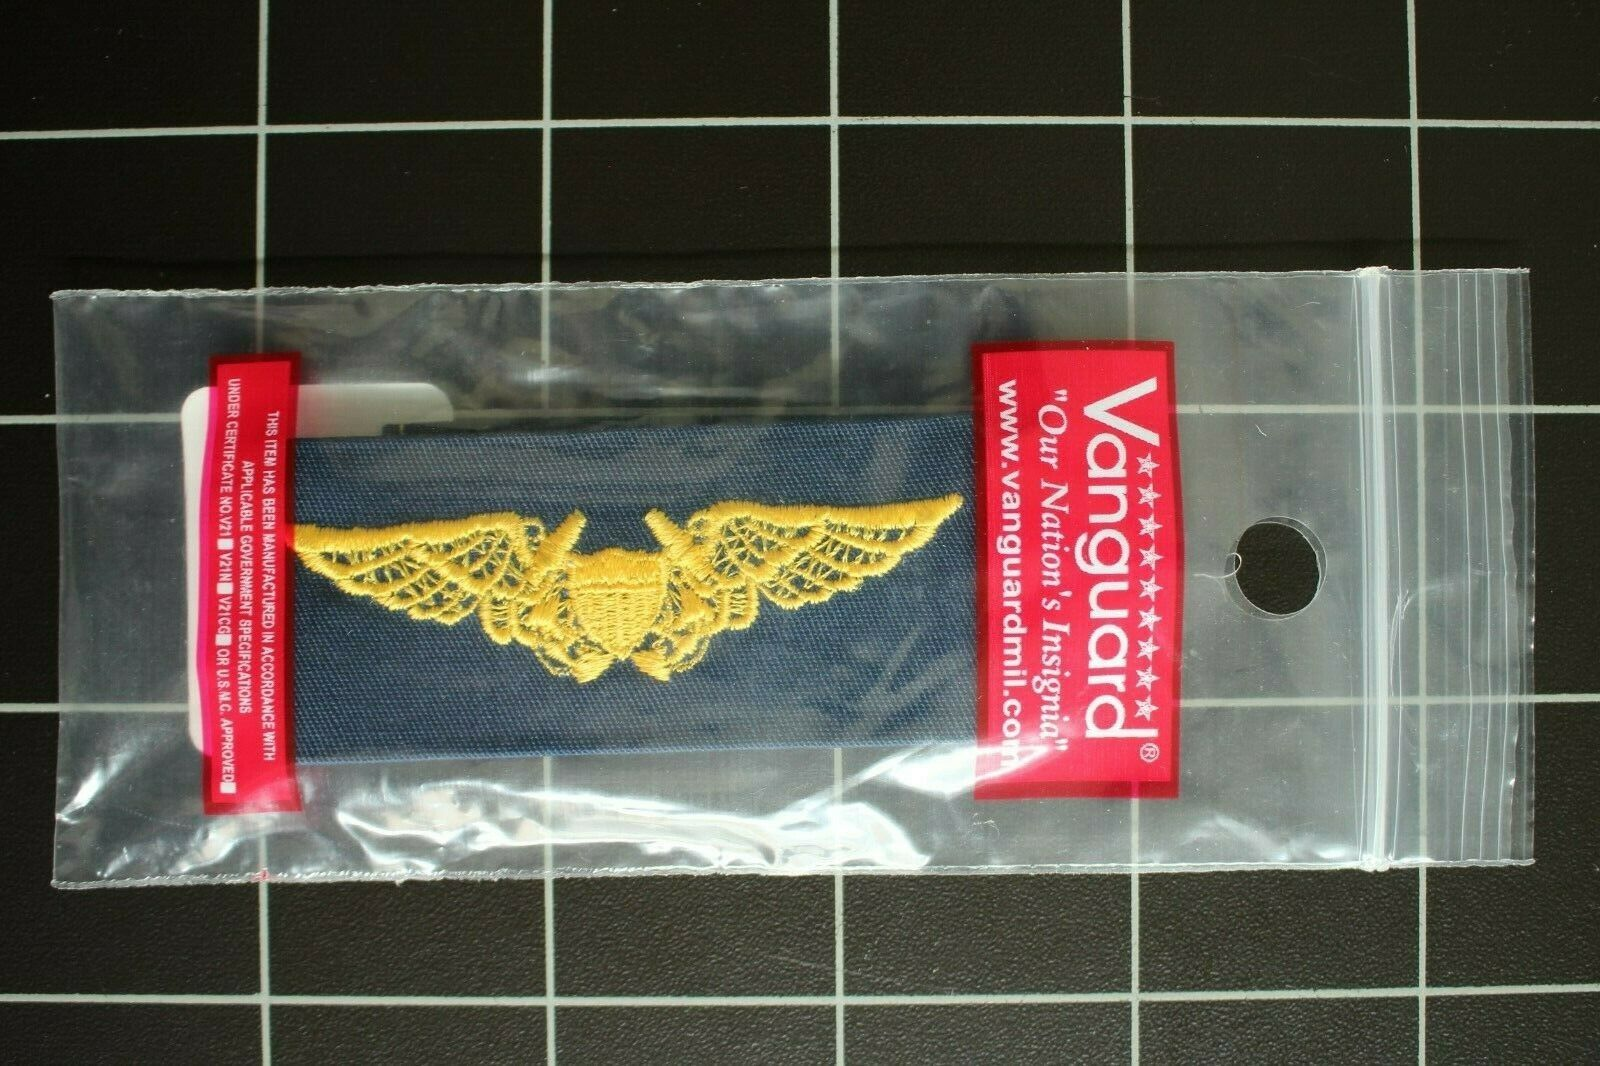 USN US NAVY BLUE COVERALL UNIFORM FLIGHT OFFICER SPECIALTY BADGE INSIGNIA TAPE - $6.88